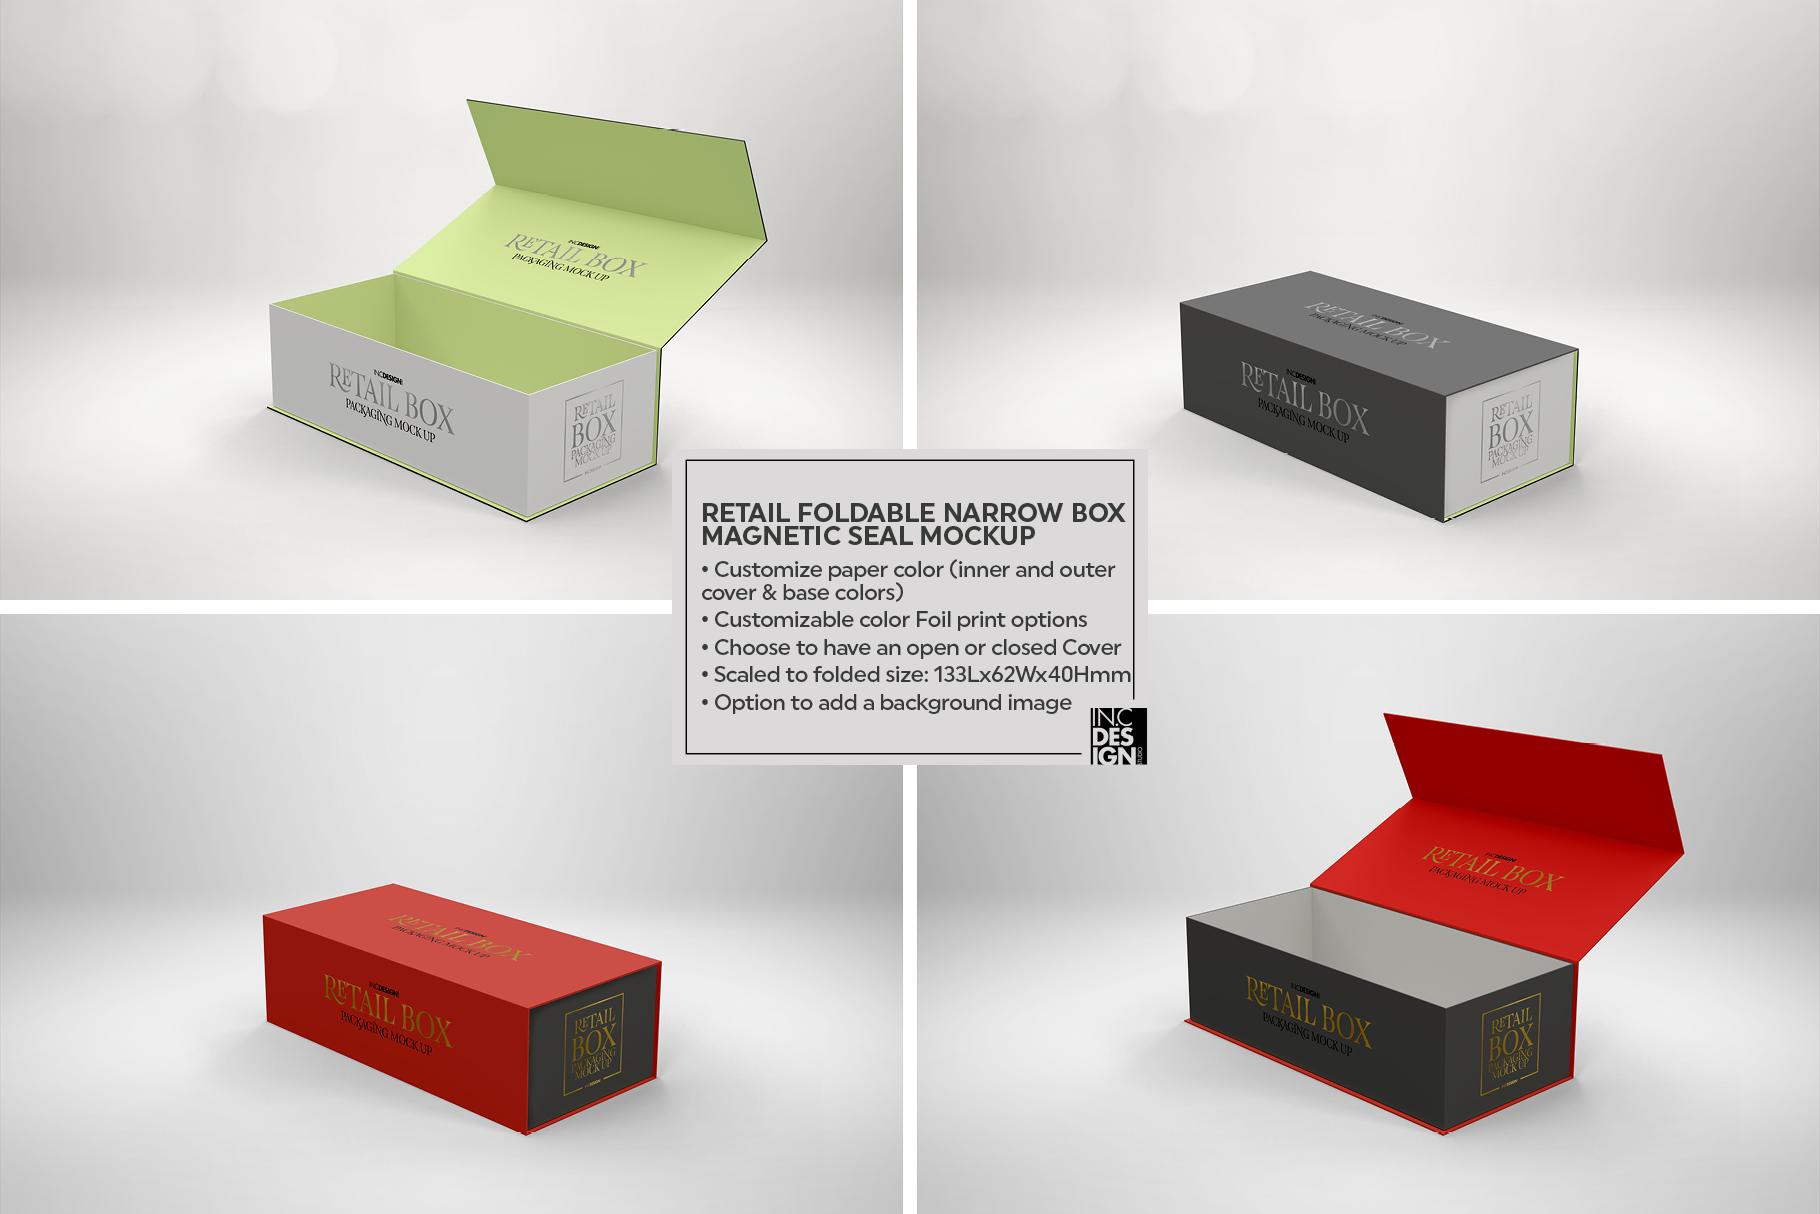 Foldable Narrow Retail Box Magnetic Seal Packaging Mockup